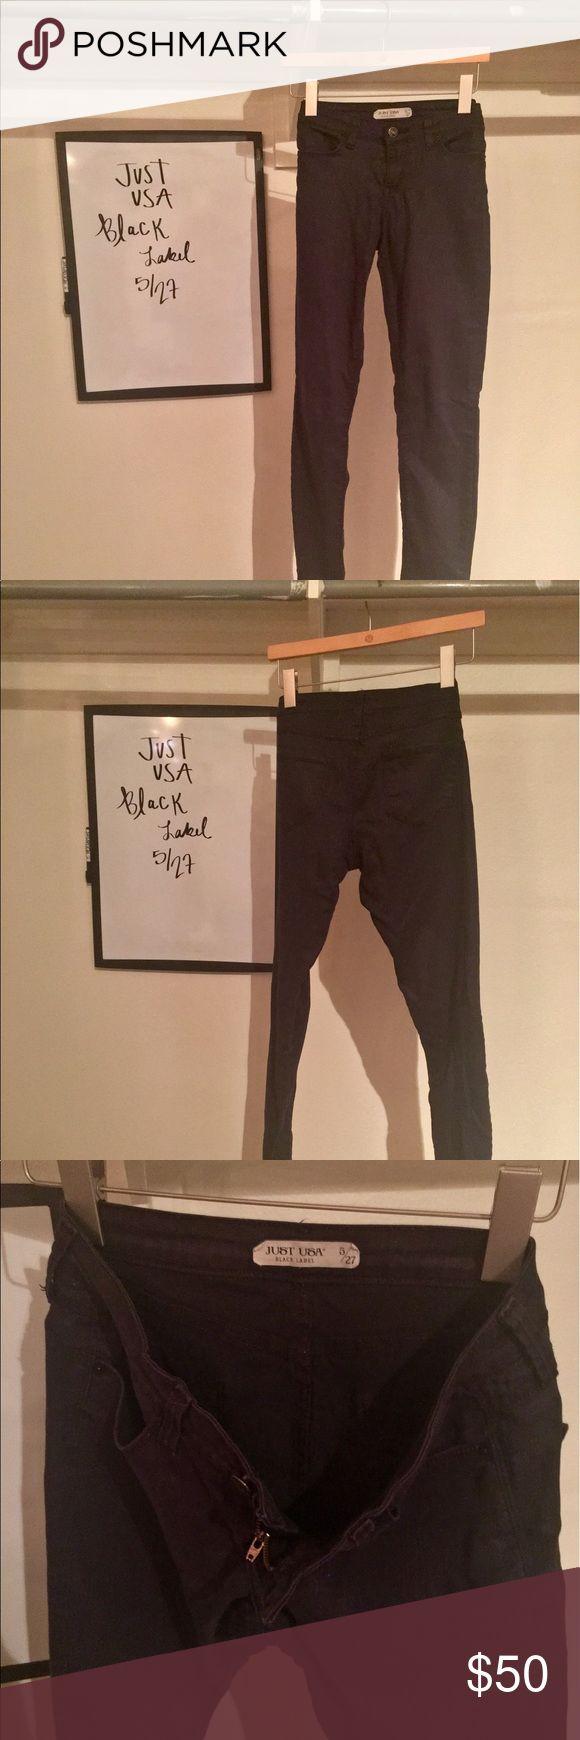 Saks Fifth Avenue - Just USA Denim Saks Fifth Avenue - Just USA Denim - Black Label - Size 5/27. Saks Fifth Avenue Black Label Jeans Straight Leg